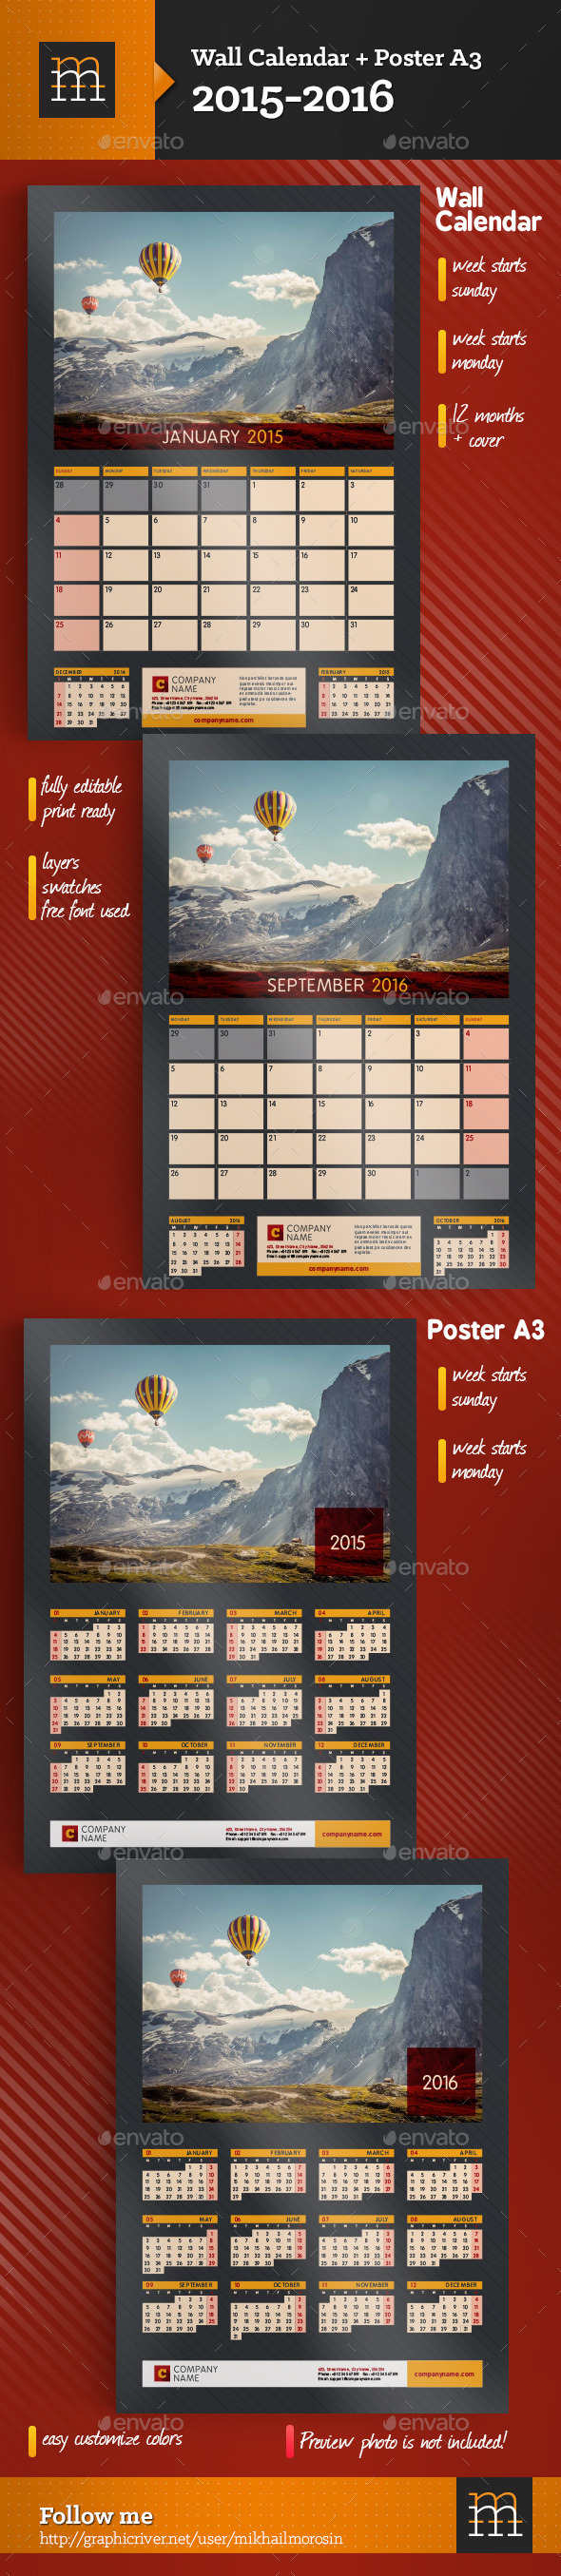 GraphicRiver 2015-2016 Wall Calendar & Poster A3 9010842